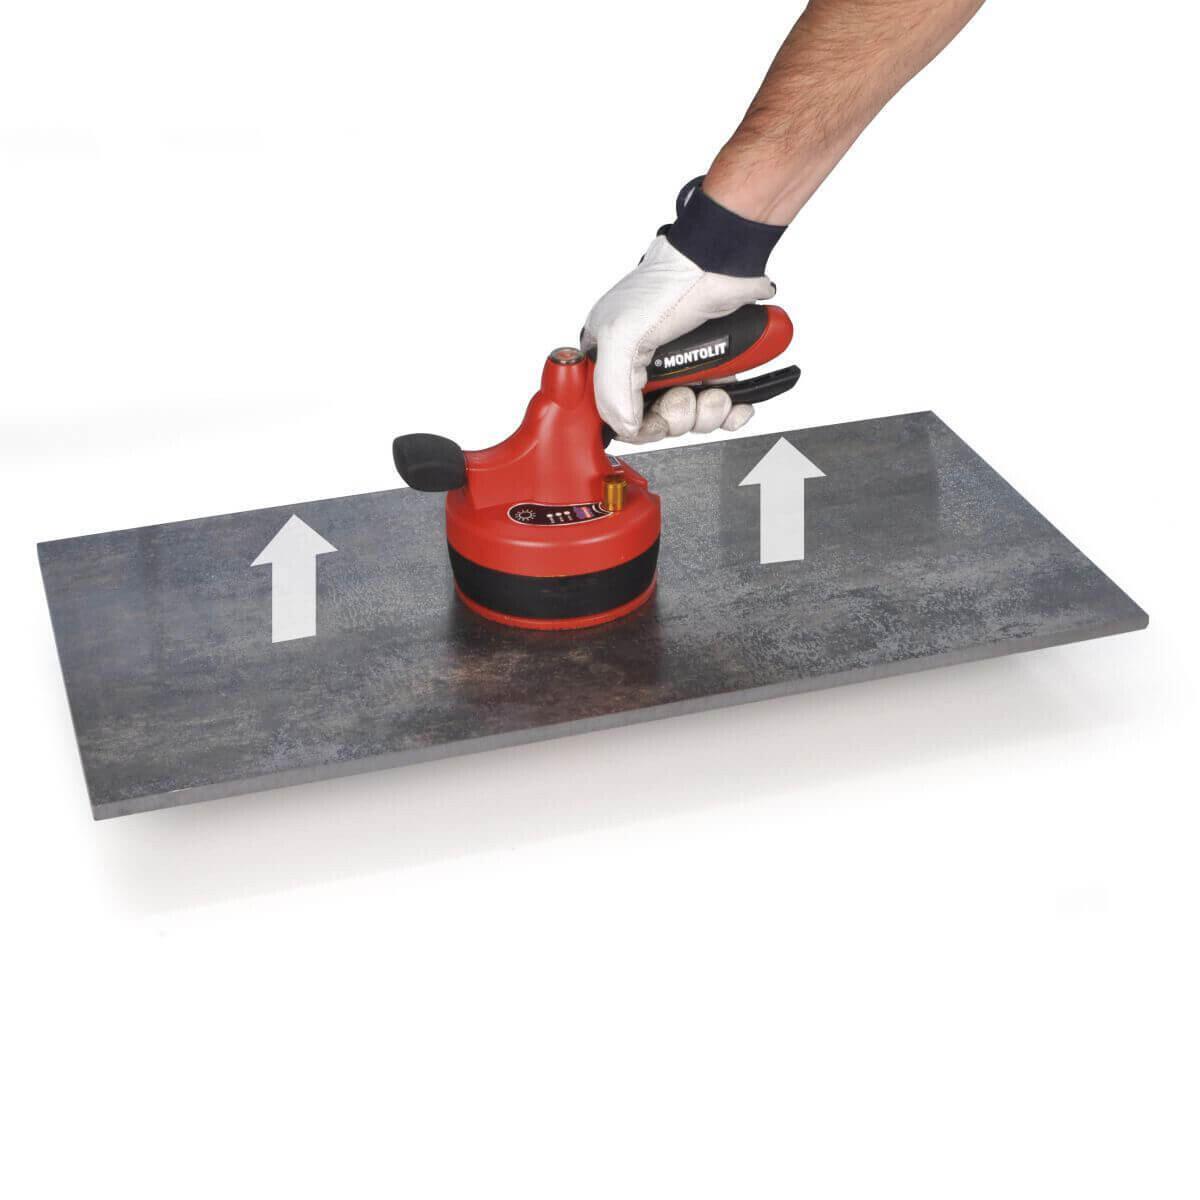 Lifting Porcelain Tile with Montolit Vibrating Suction Cup